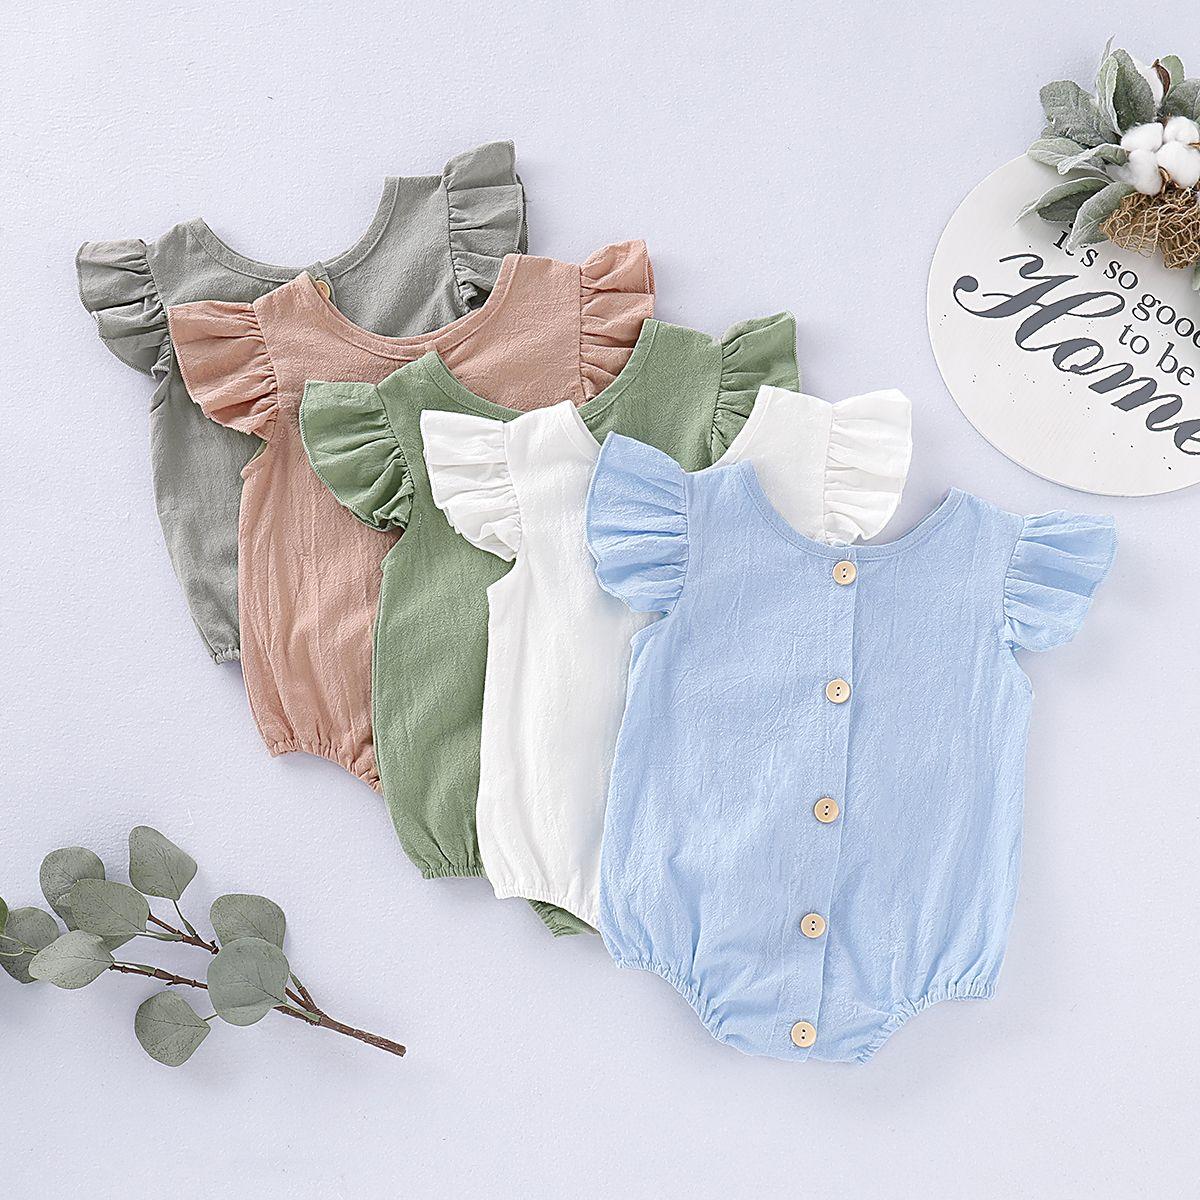 Newborn Baby Boy Girl Romper Bodysuit Sunsuit Summer Outfit Set Clothes US